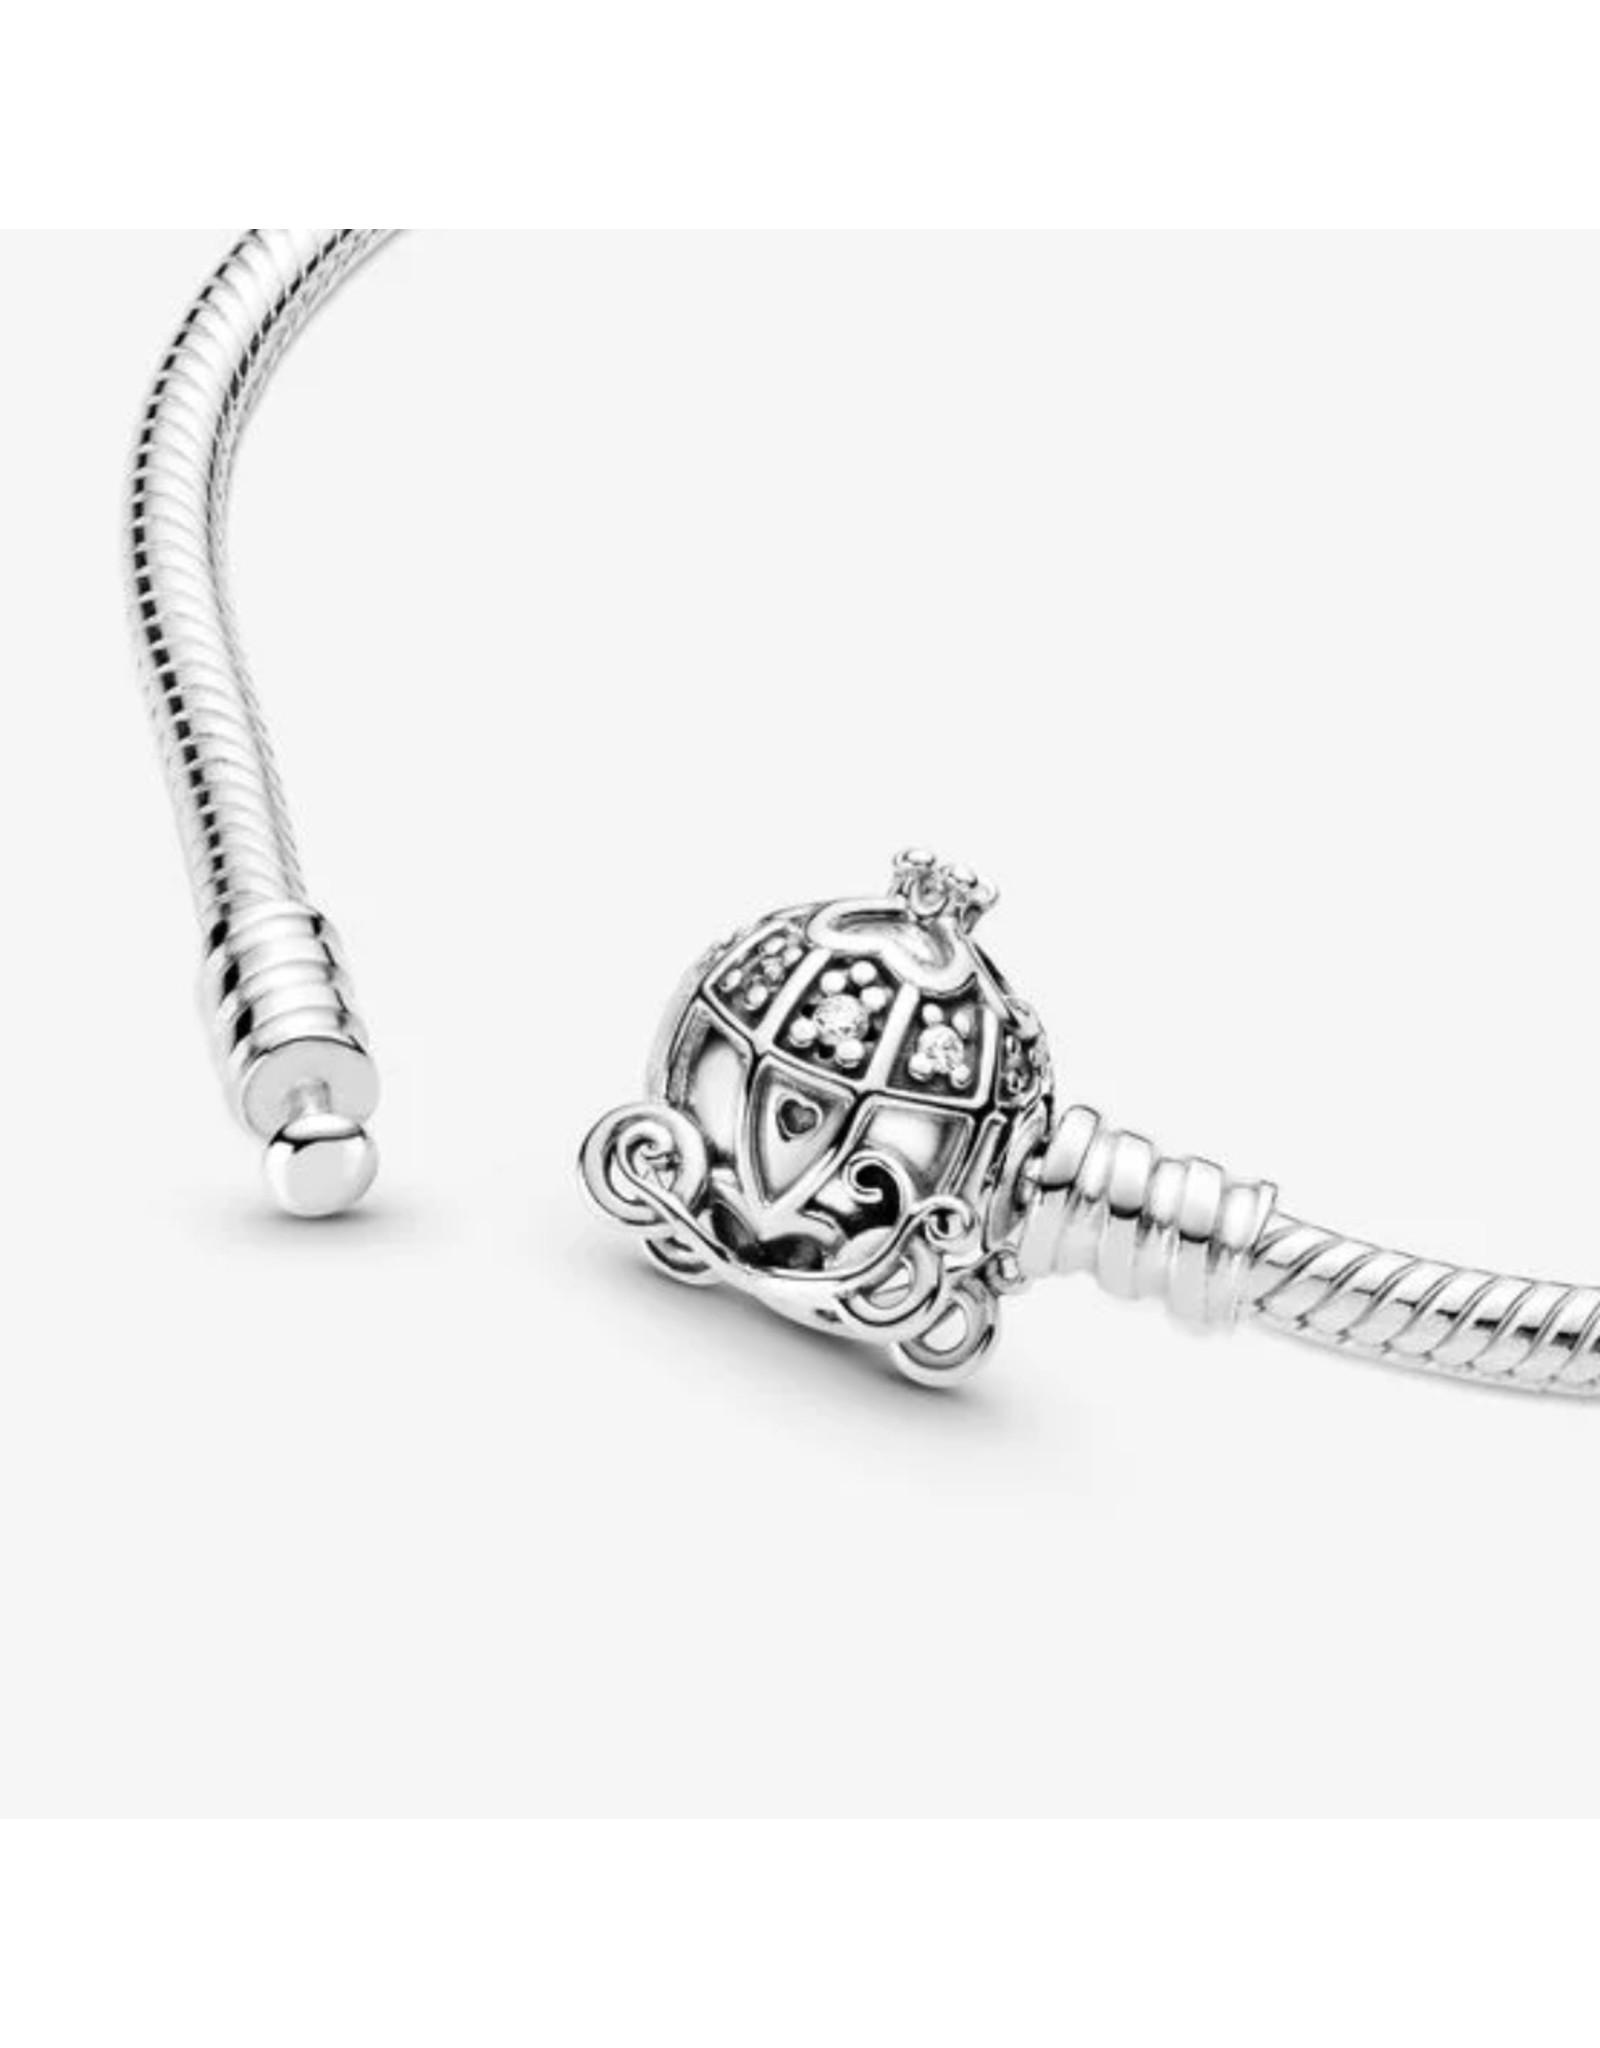 Pandora Pandora Bracelet,599190C01, Disney, Cinderella Pumpkin Coach Clasp